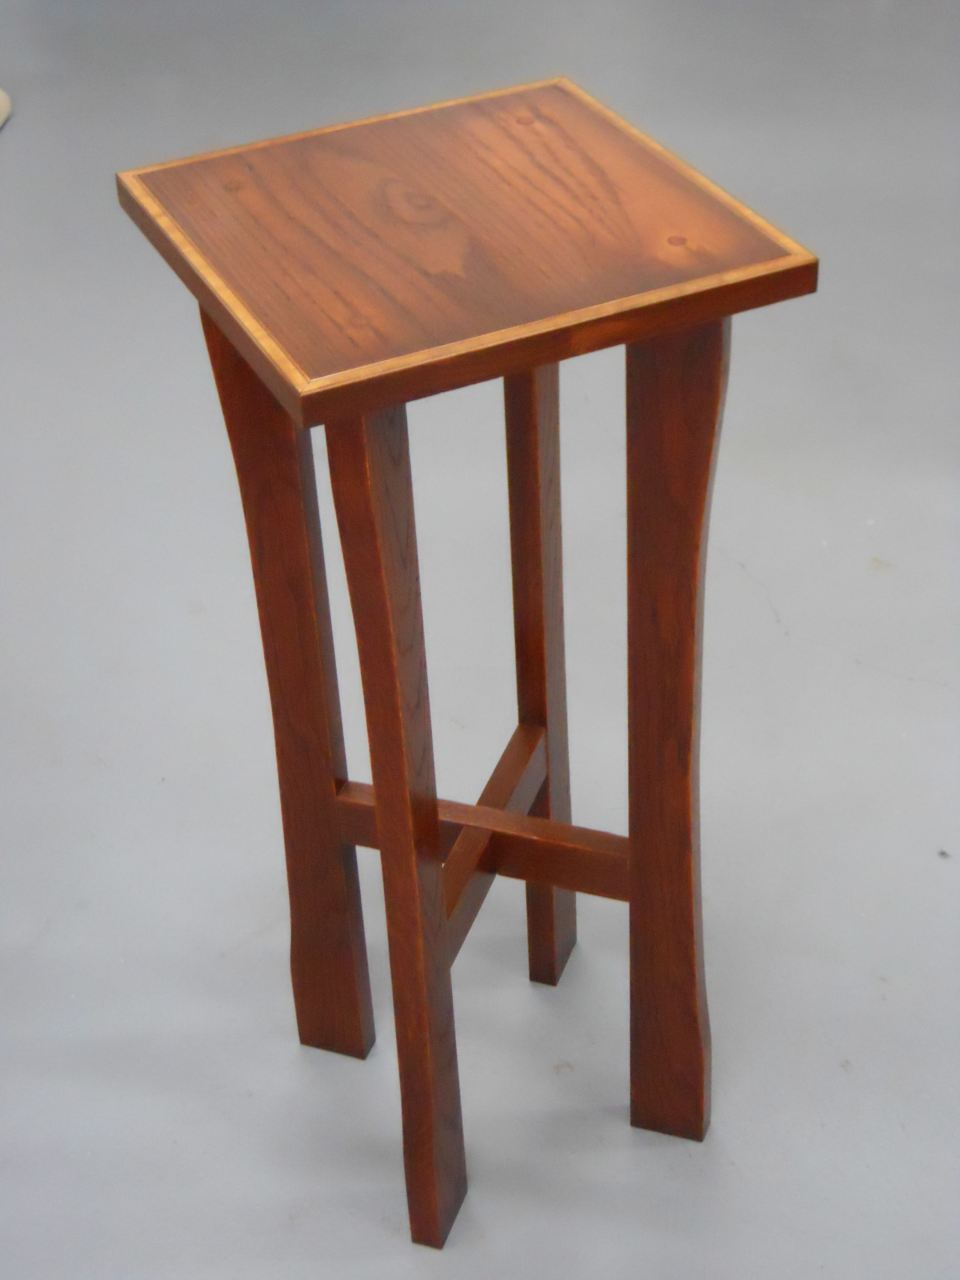 Plans For Wooden Utility Shelves Plans imac computer desk plans ...